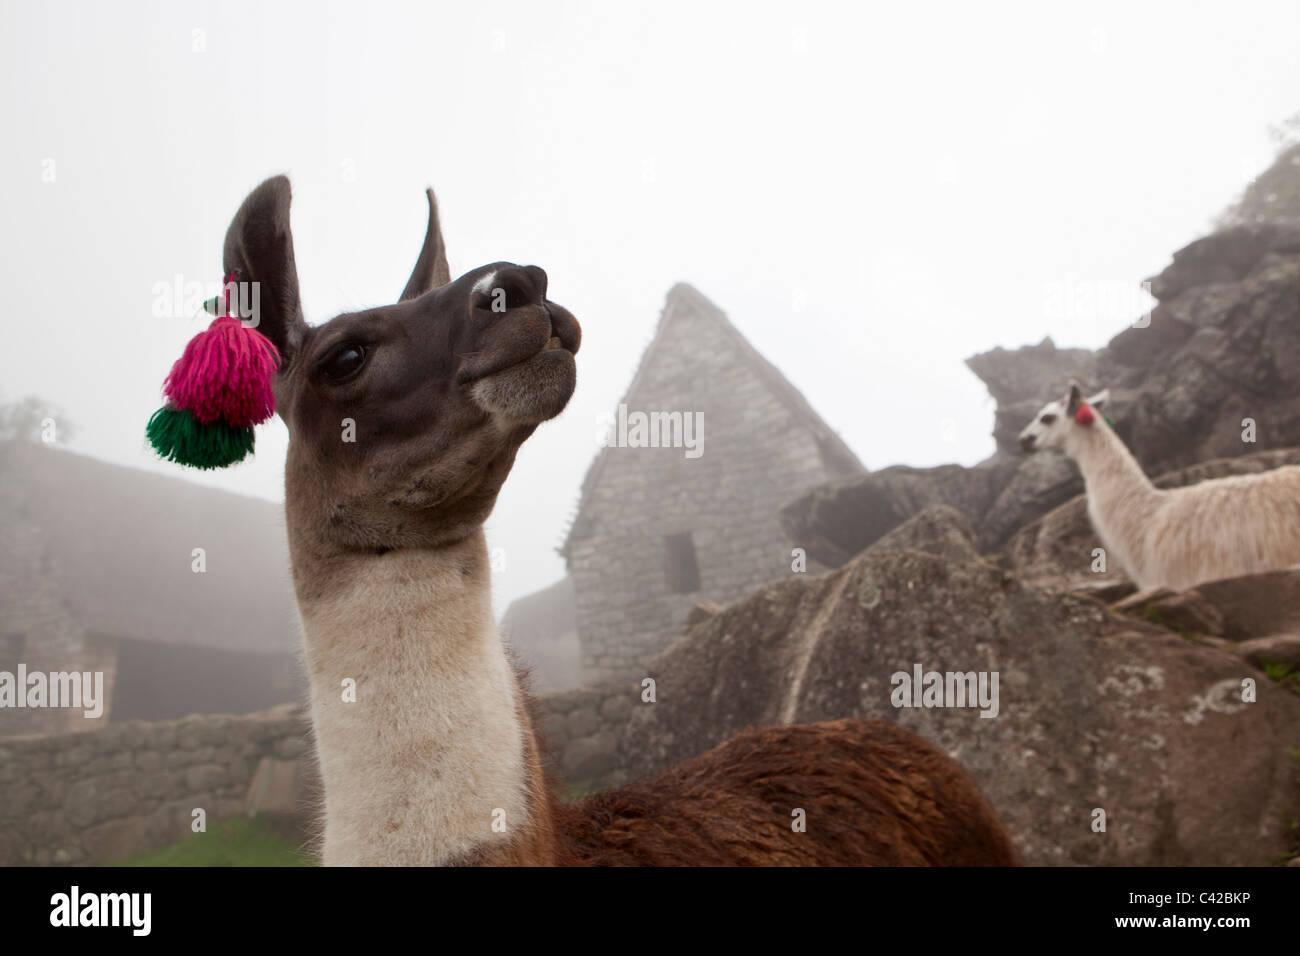 Peru, 15th-century Inca site located 2,430 metres (7,970 ft) above sea level. Llama. (Lama glama). - Stock Image